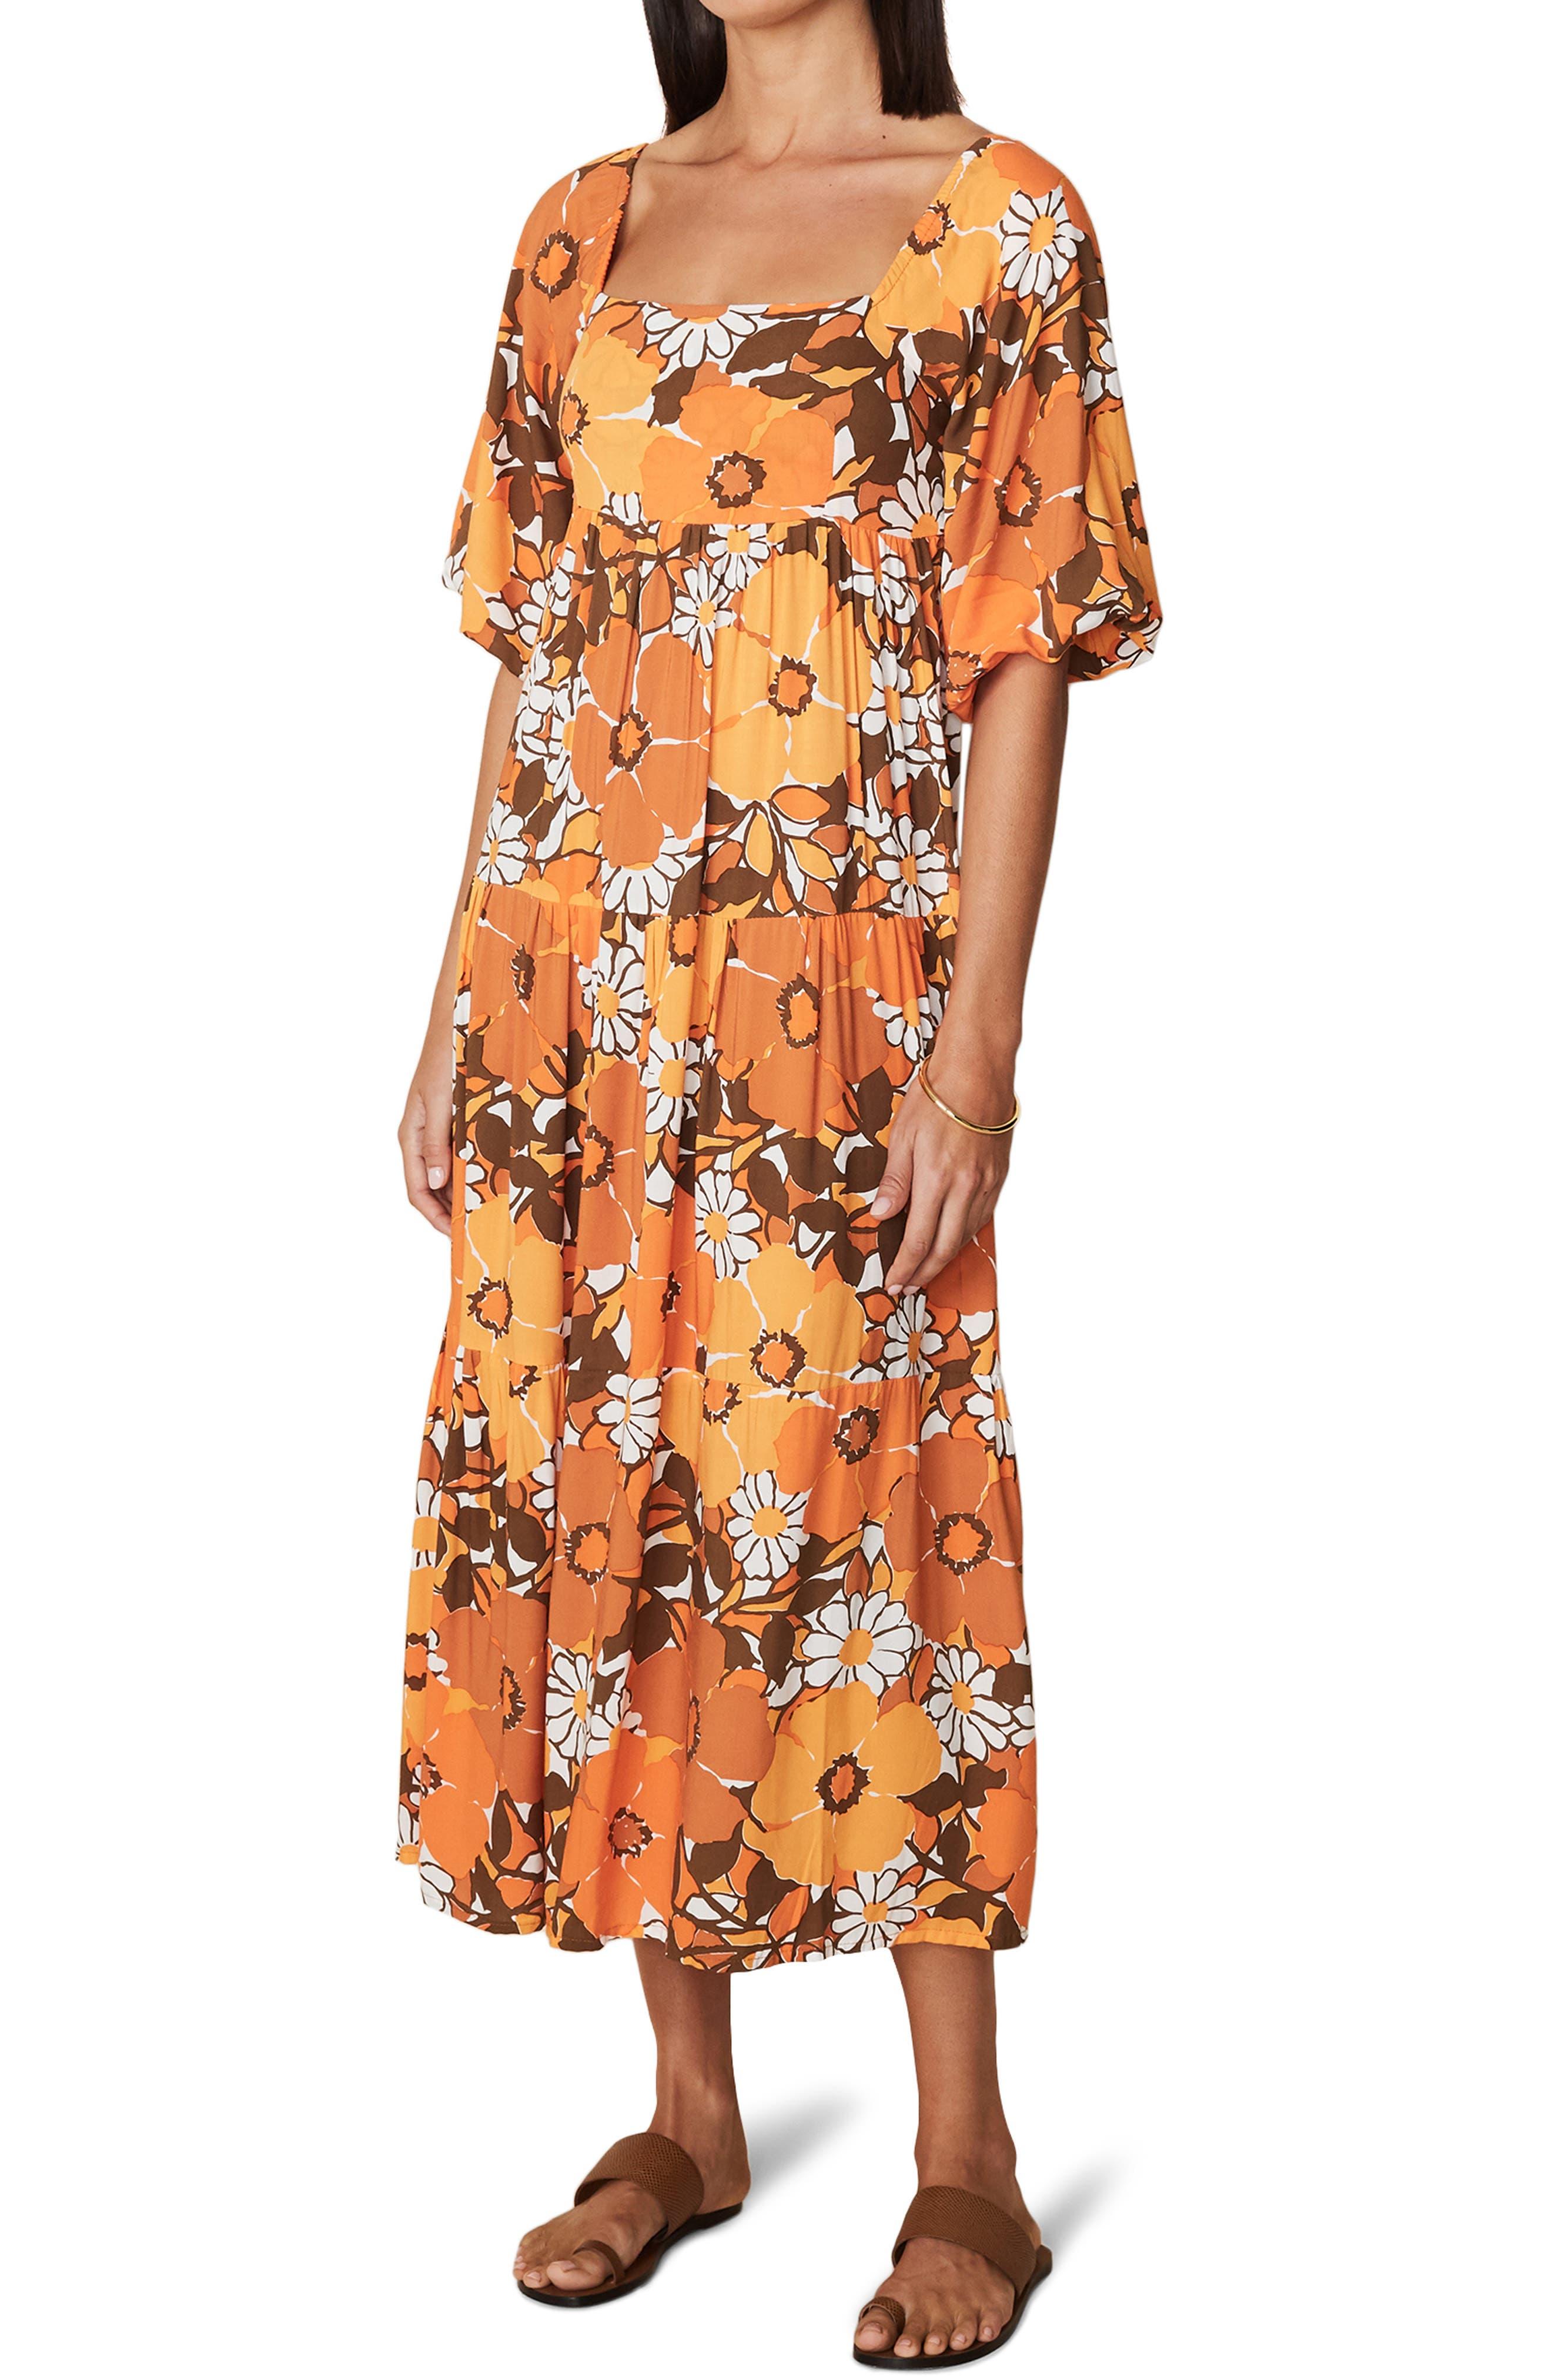 60s Dresses   1960s Dresses Mod, Mini, Hippie Womens Faithfull The Brand Floral Tiered Midi Dress Size XX-Large - Orange $229.00 AT vintagedancer.com